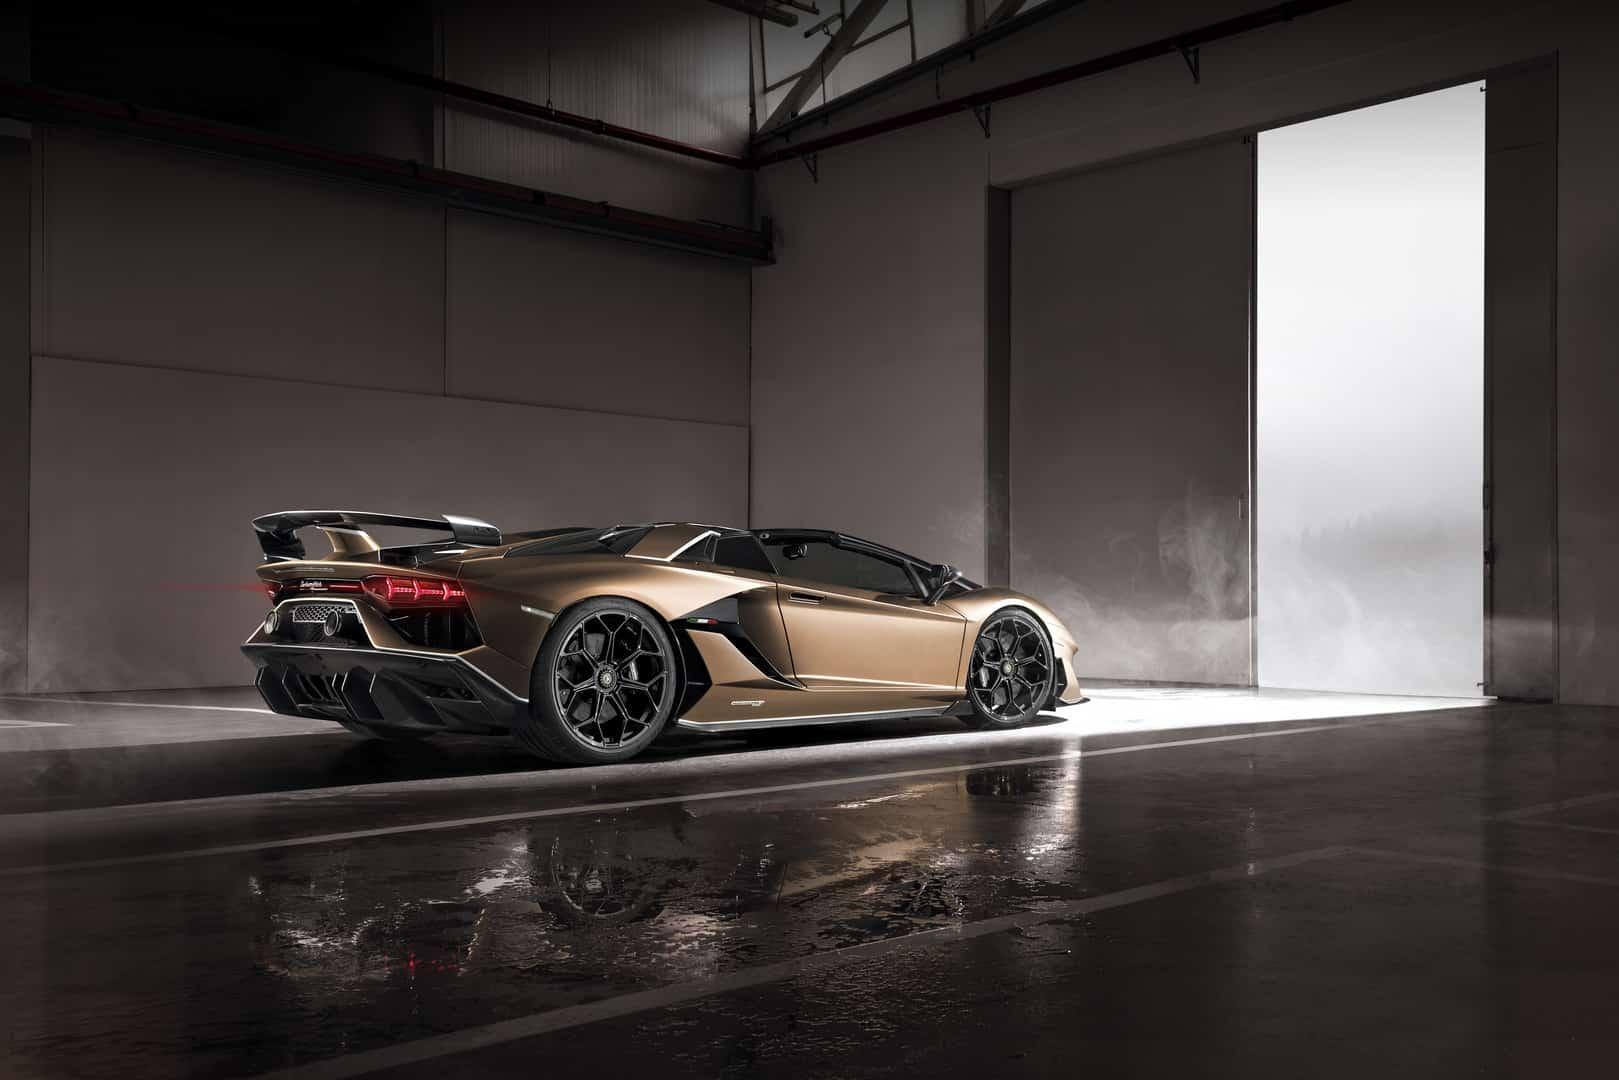 Lamborghini Aventador SVJ Roadster Goes Roofless